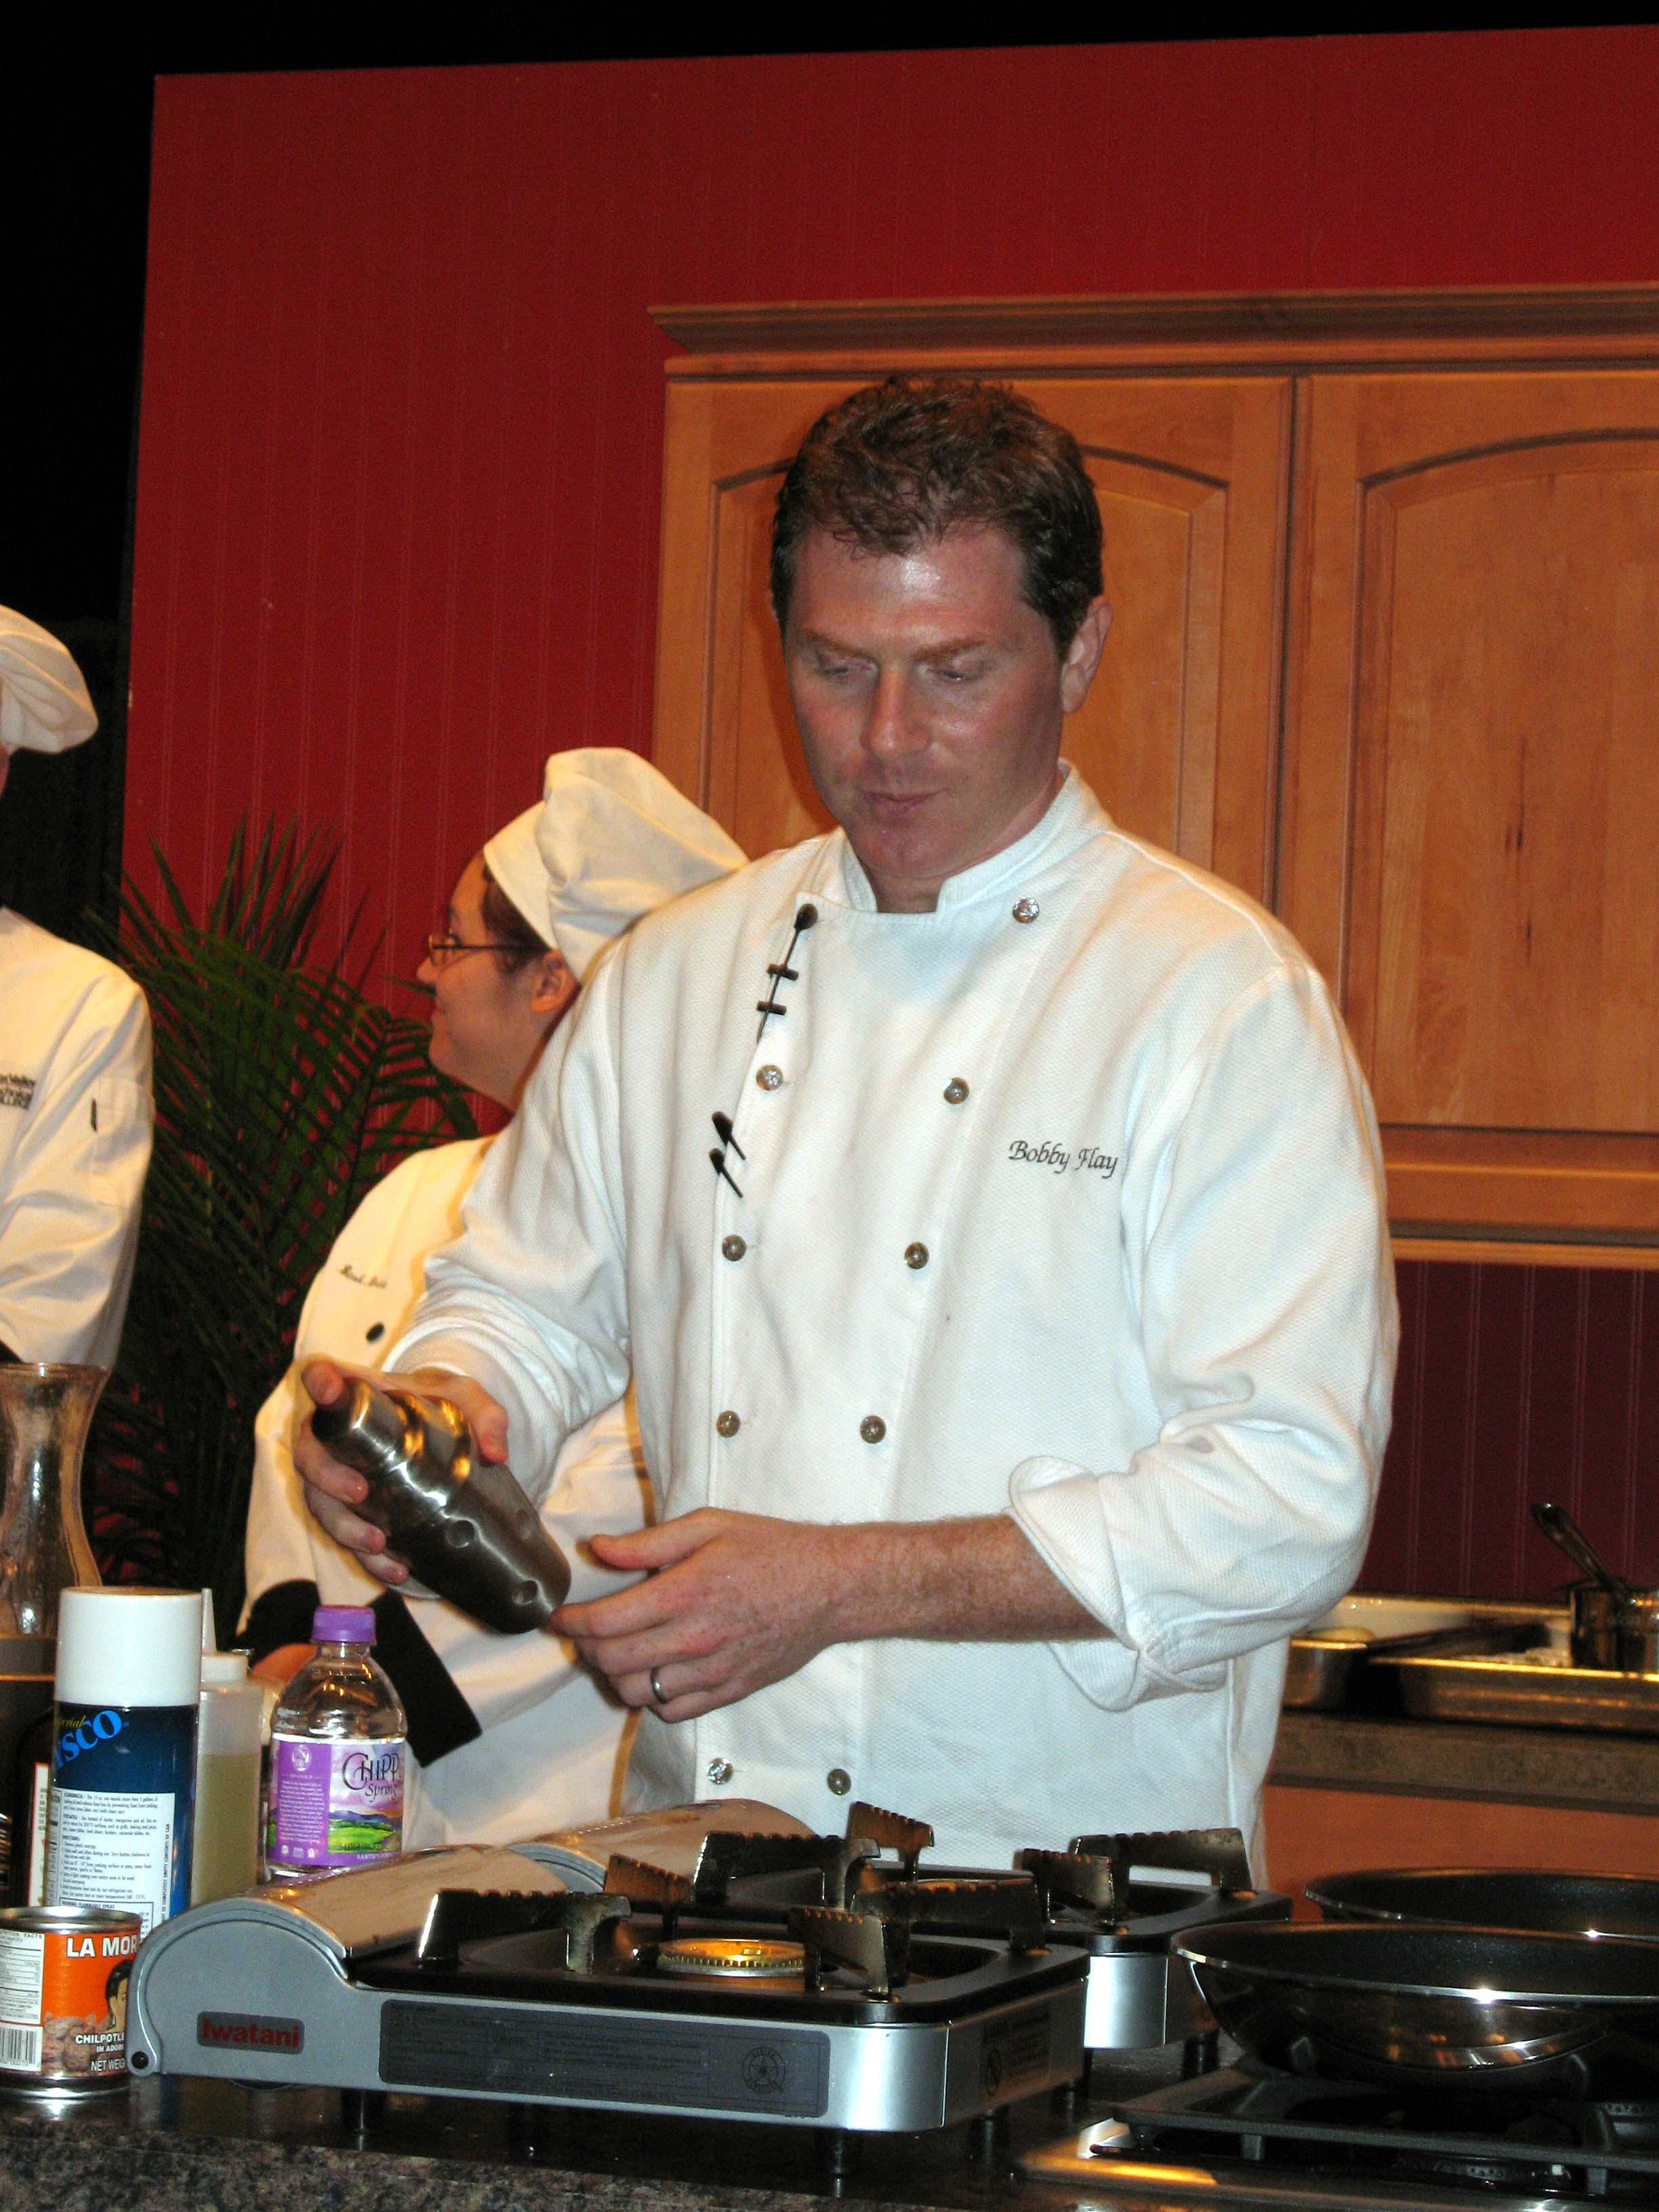 Cooking pdf stewart martha school